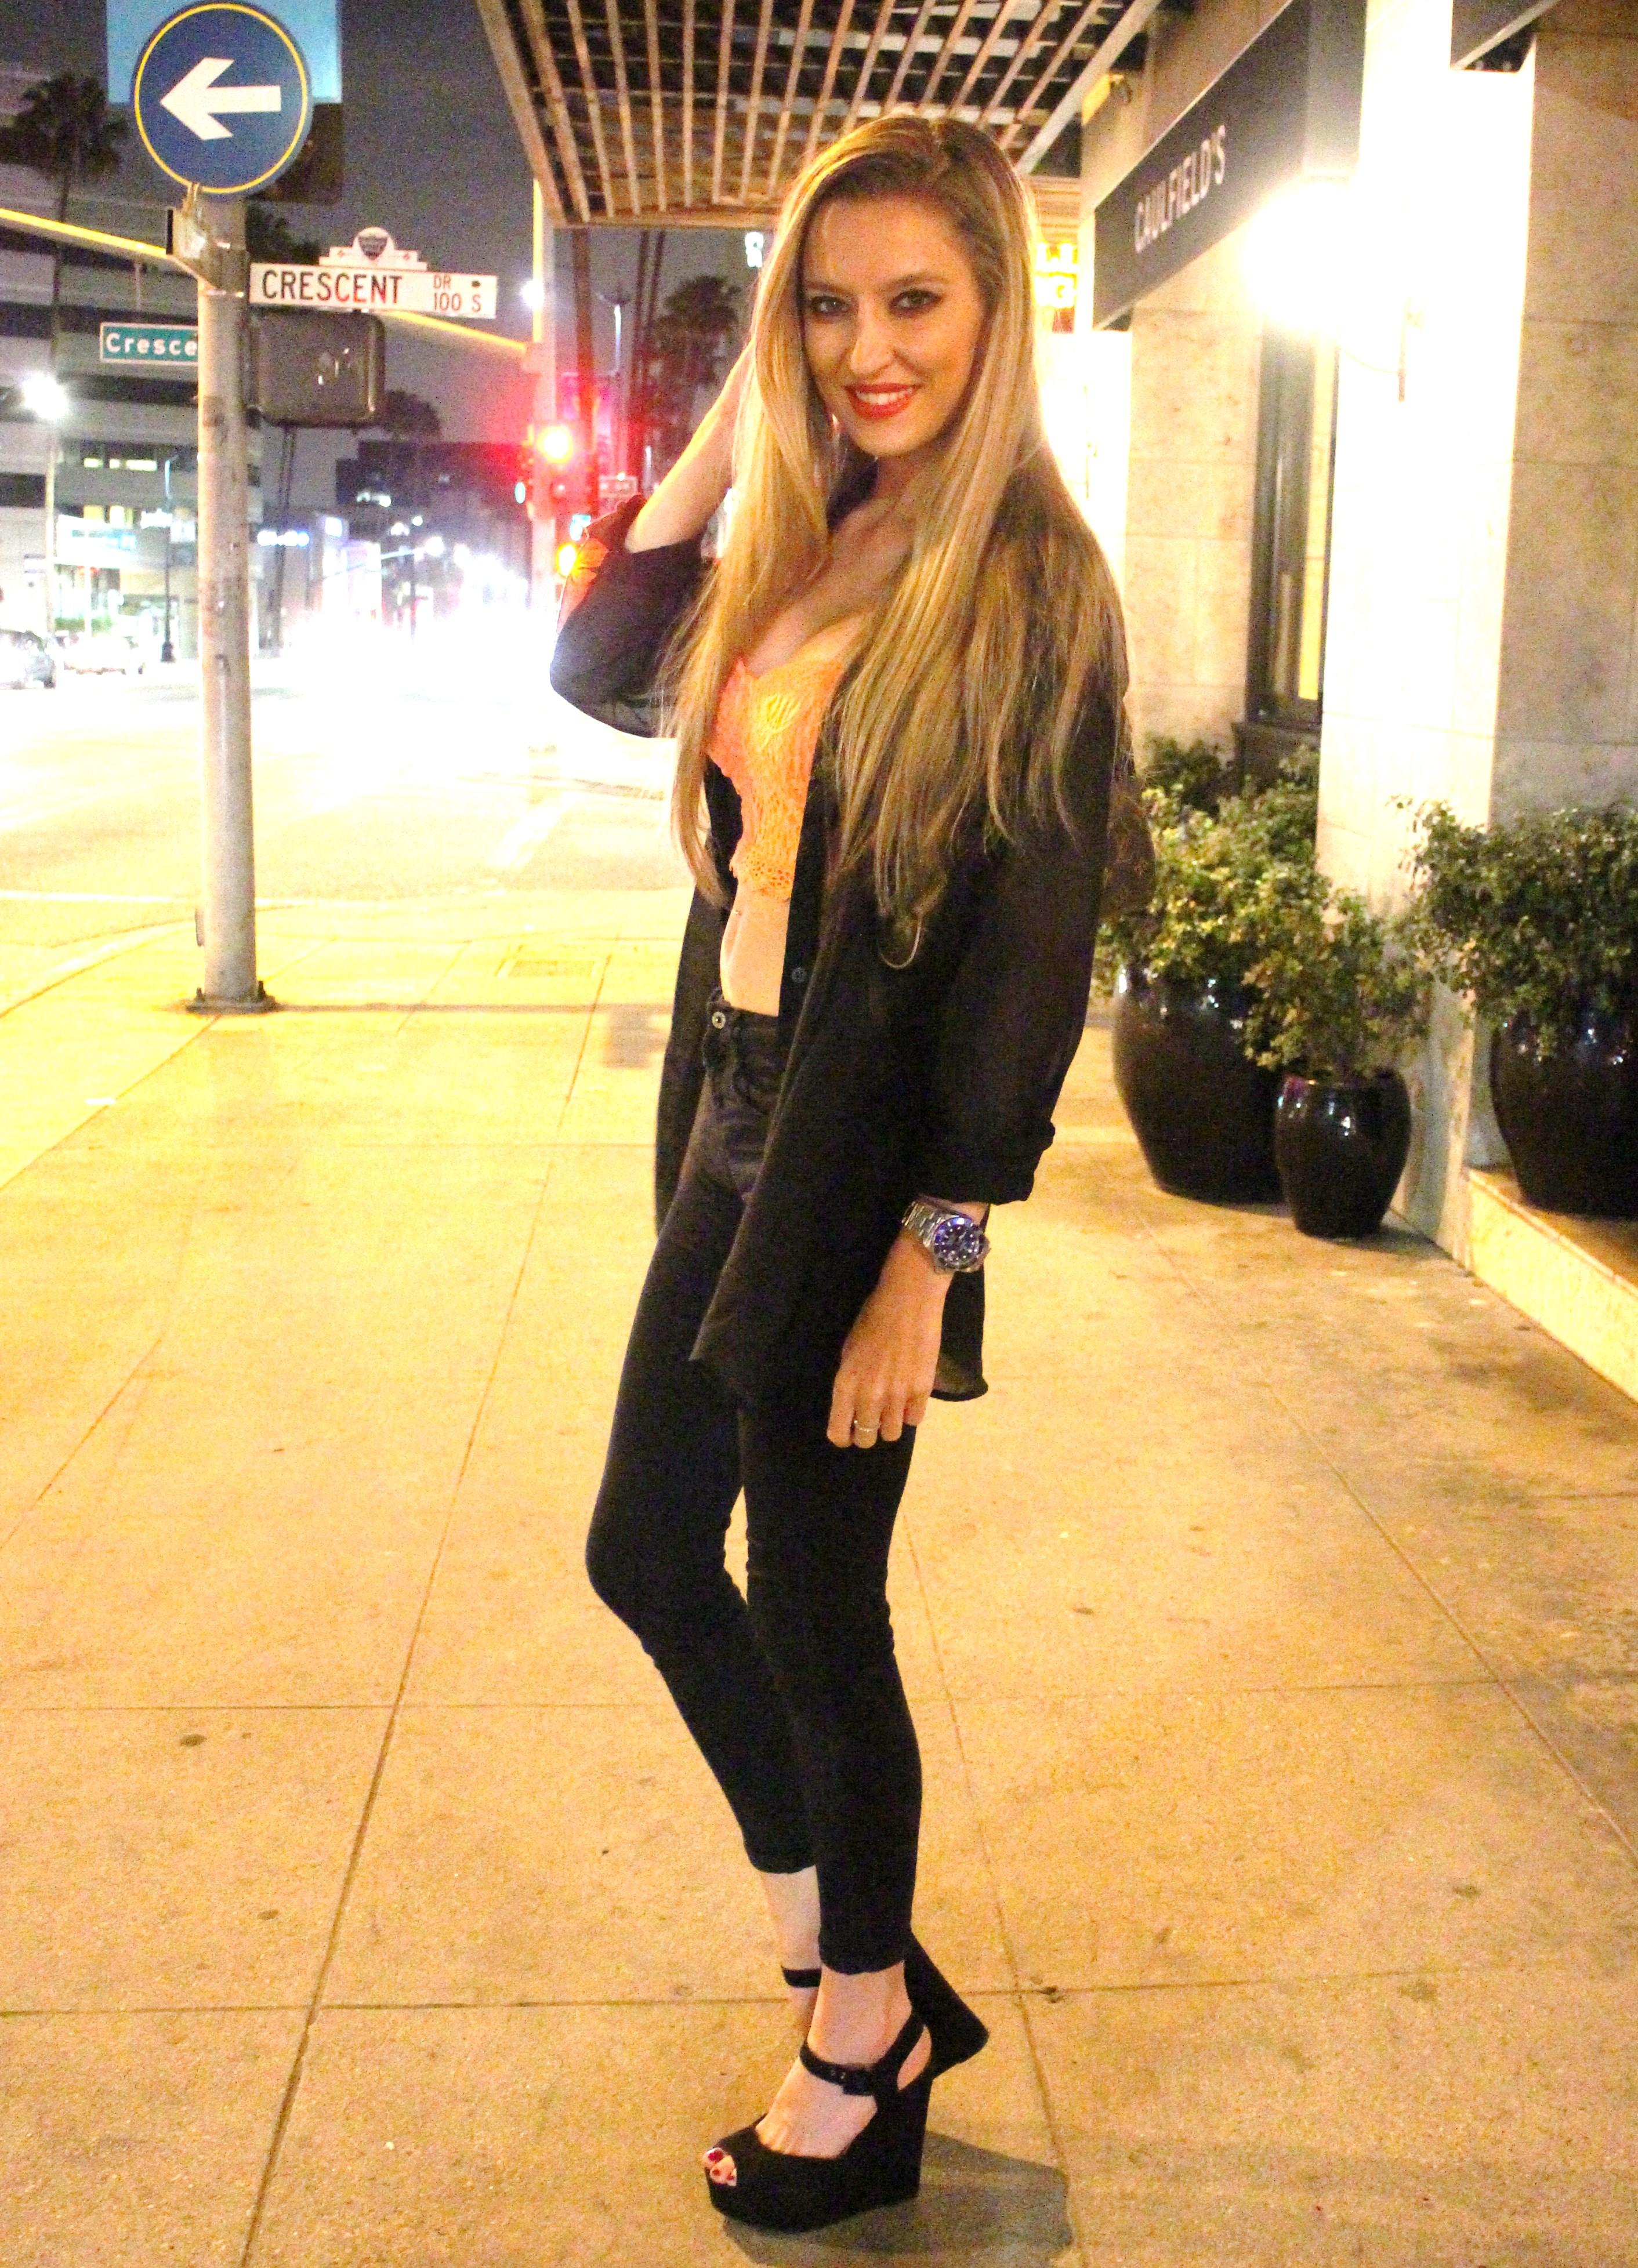 Black_Coral_Lights_Los_Angeles_Louis_Vuitton_Lara_Martin_Gilarranz_Bymyheels (1)